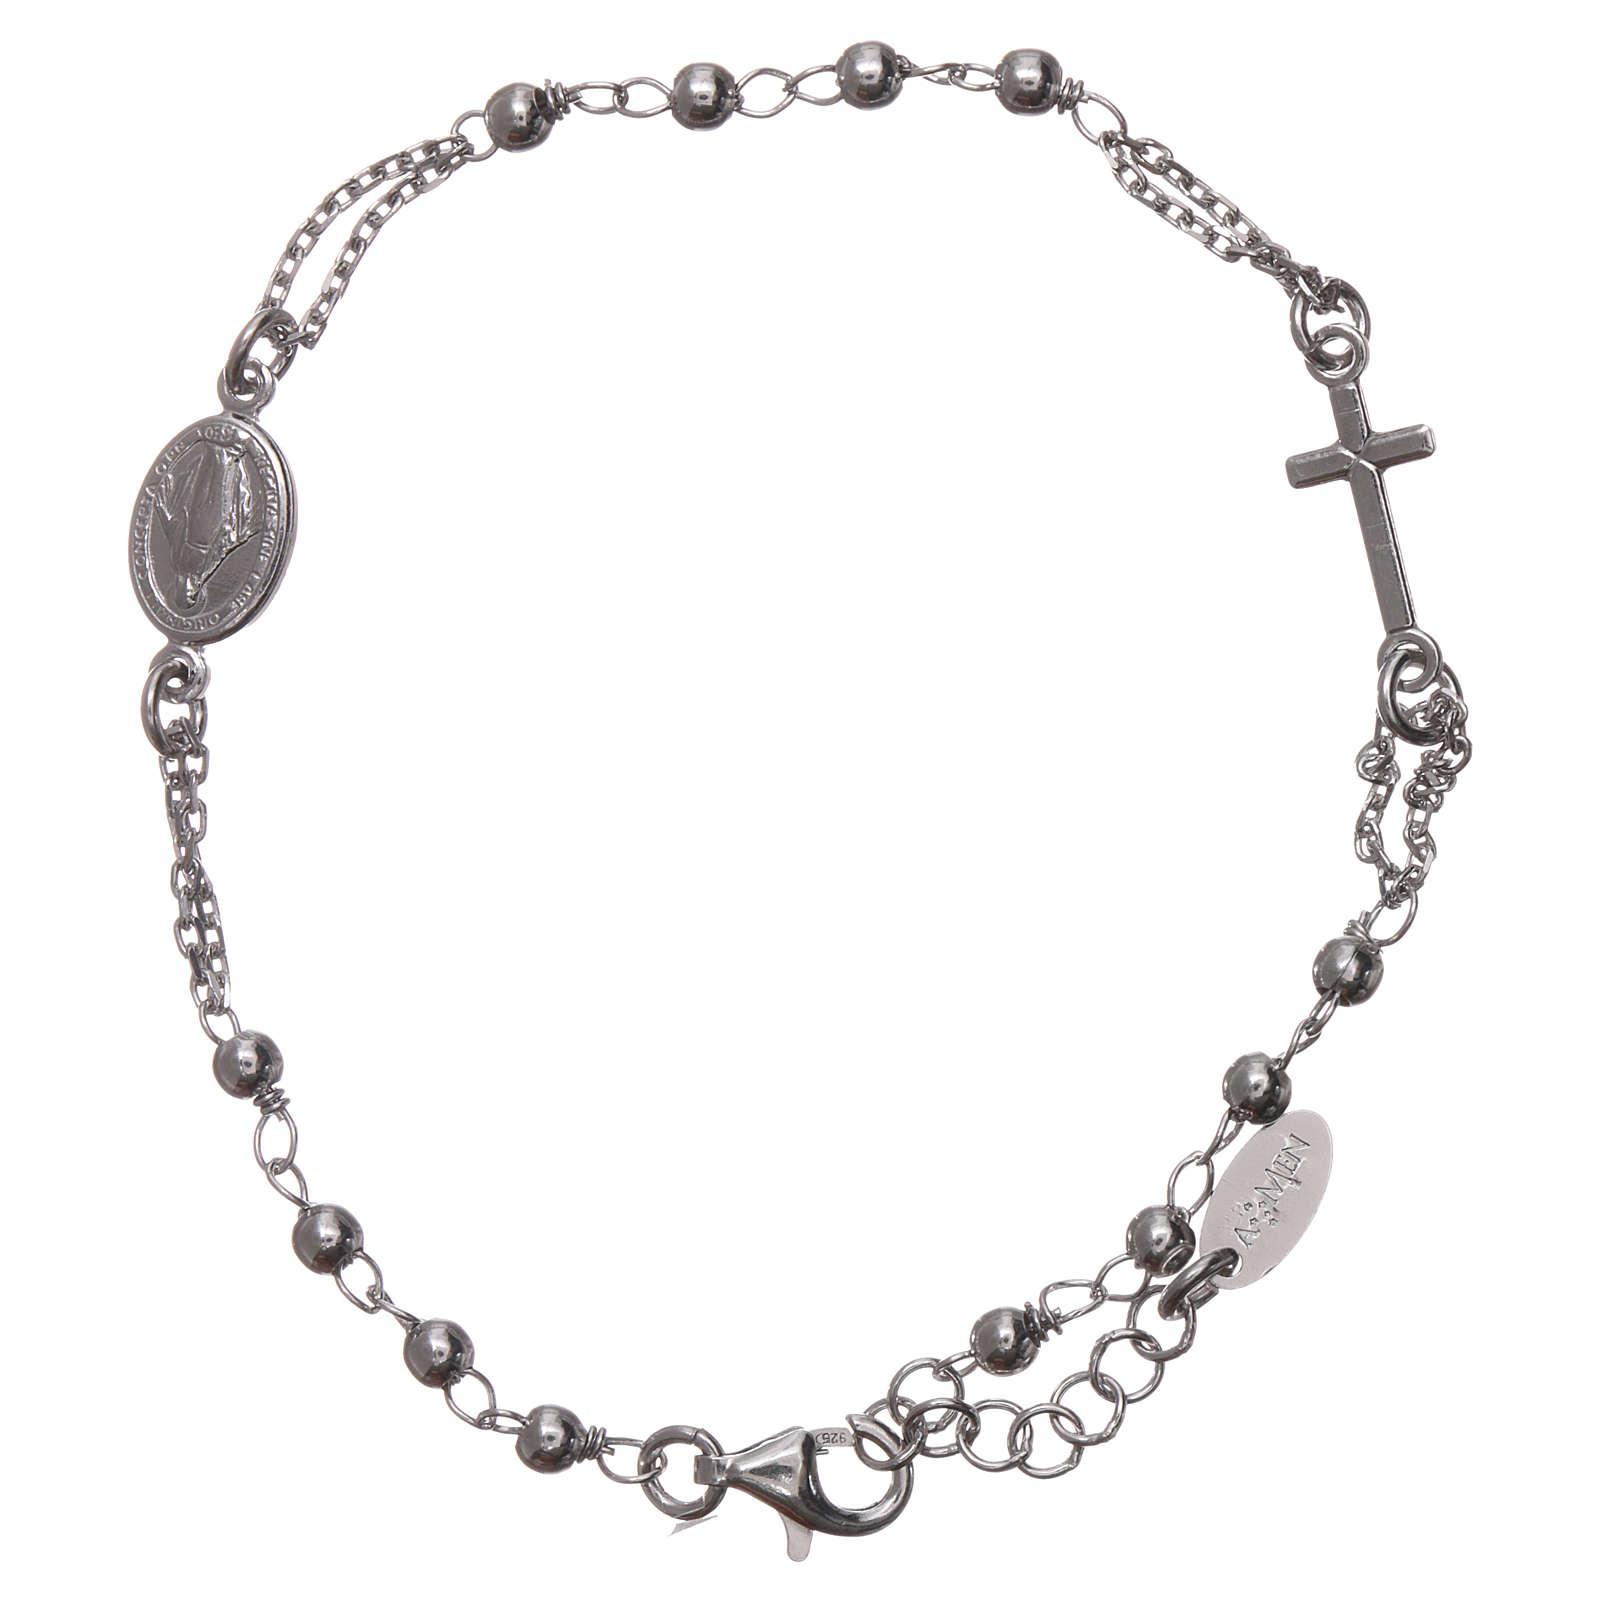 Rosary AMEN Bracelet rhodium-plated silver 925 4